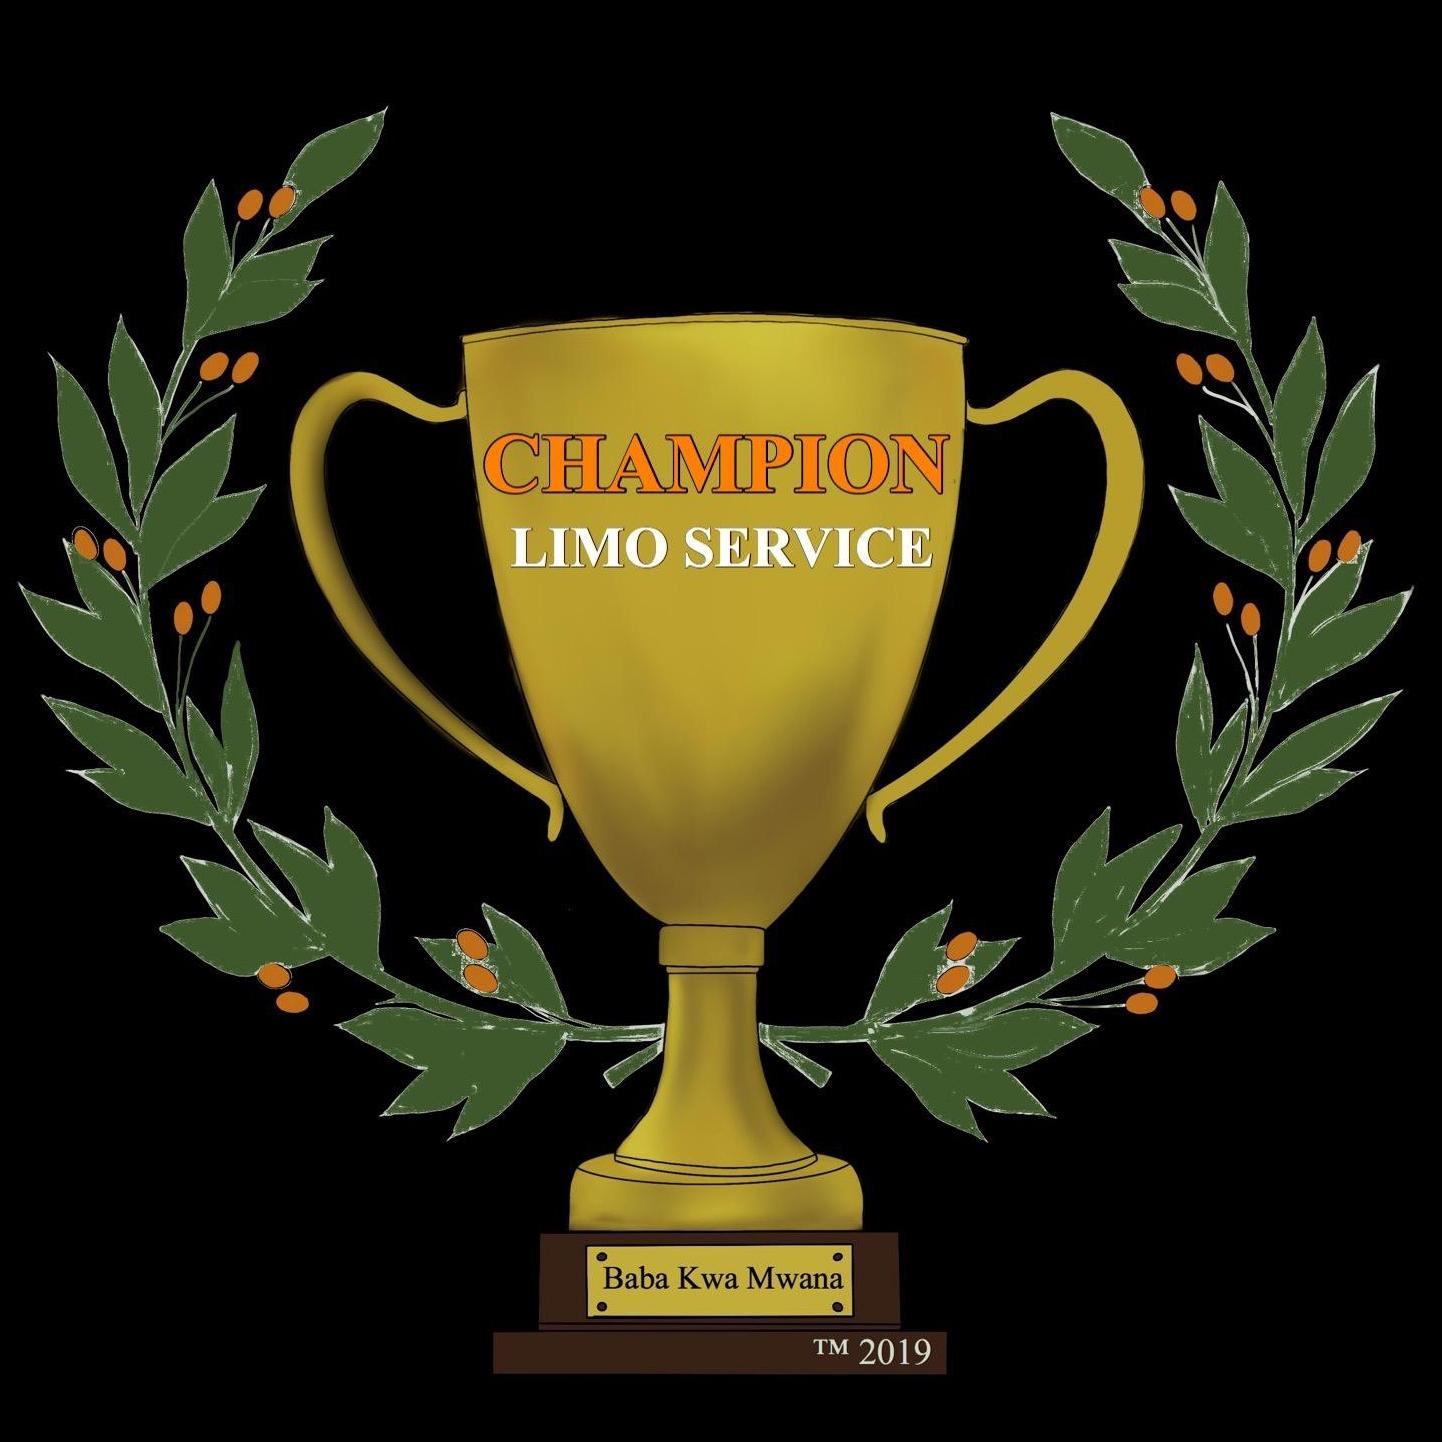 Champion Limo Service